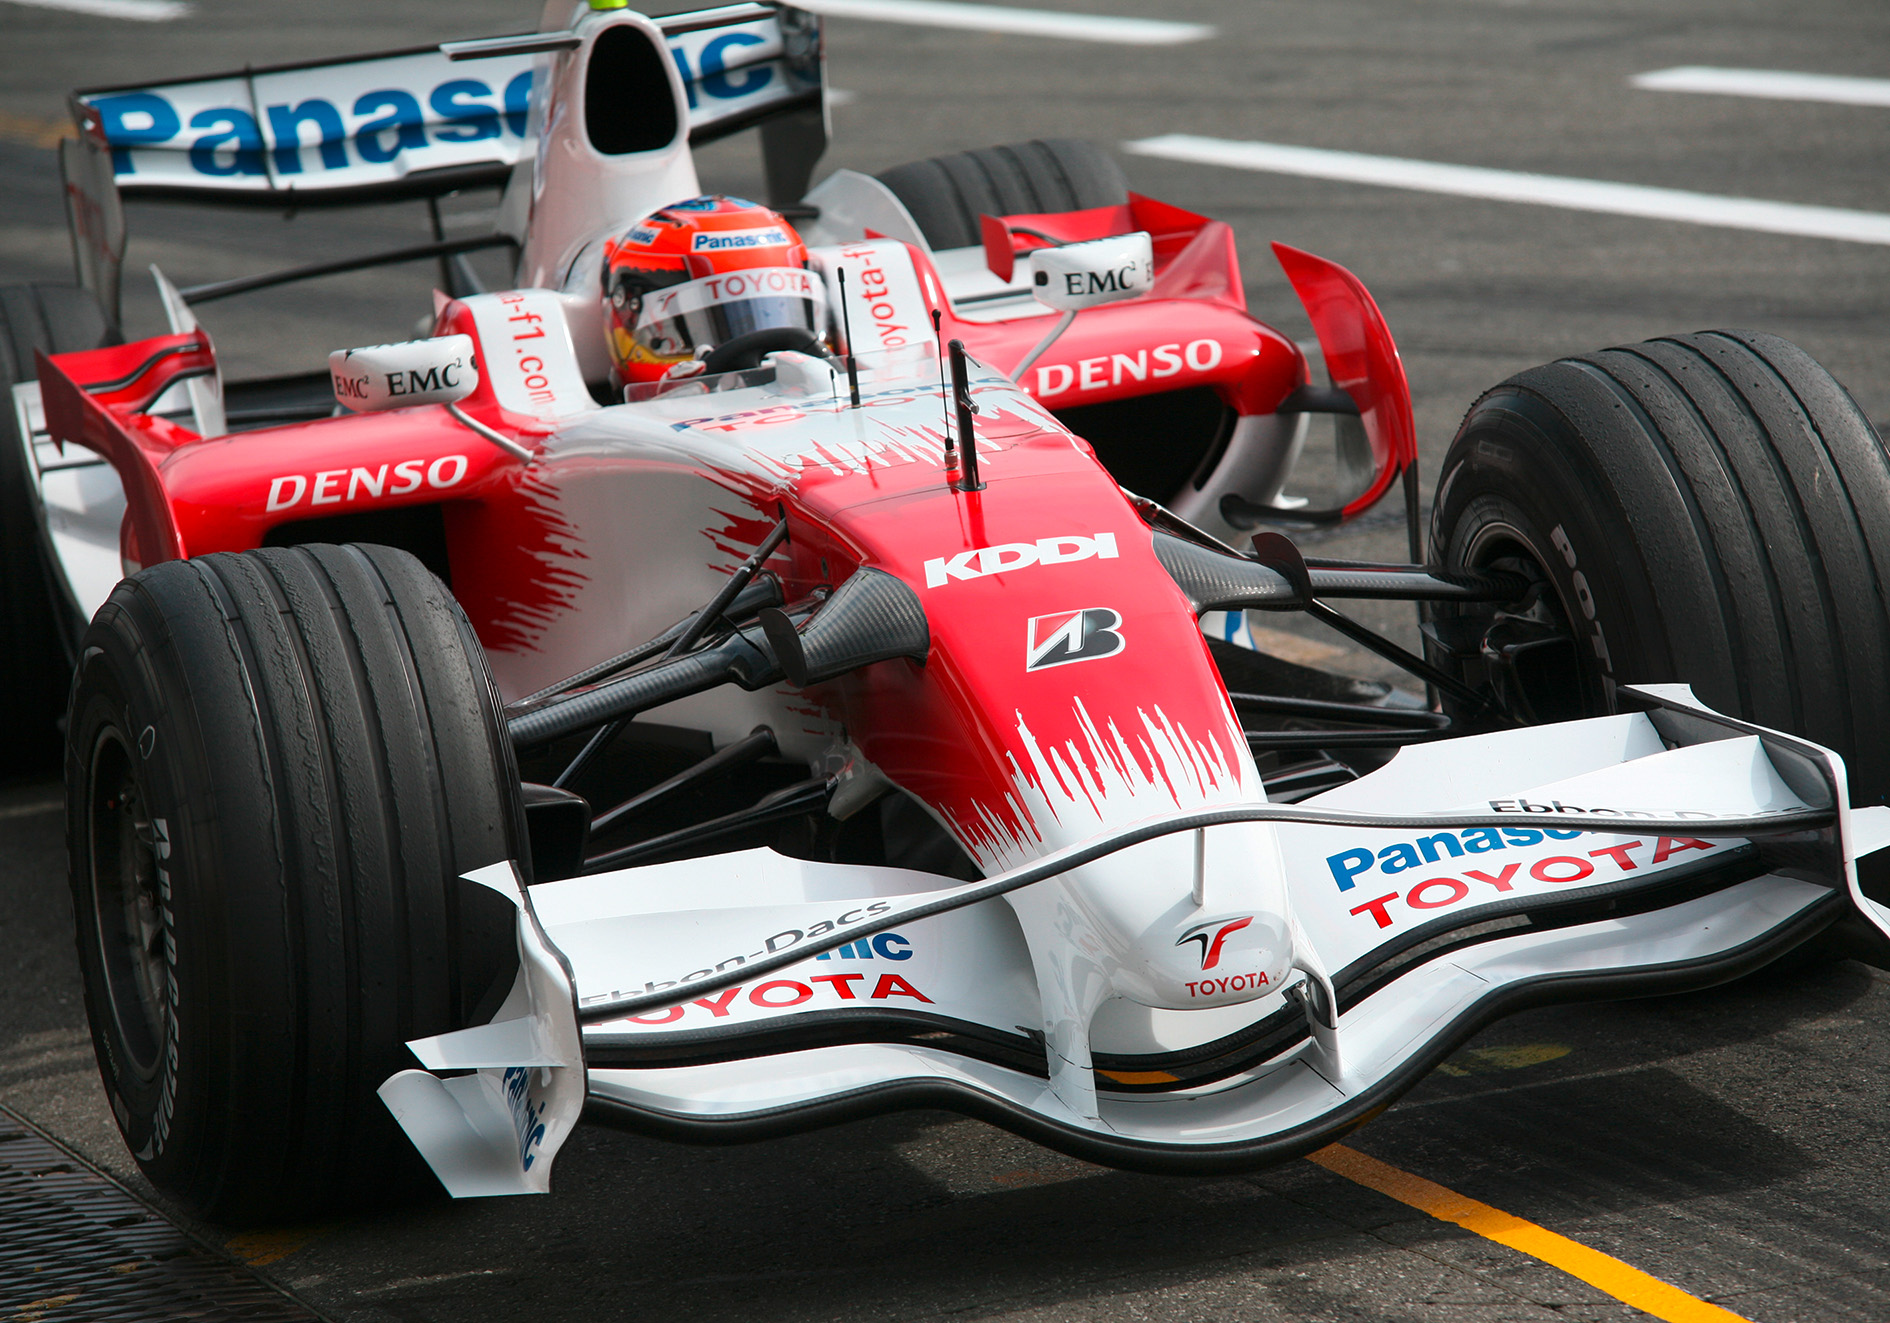 11_Josekdesign_Toyota_F1_Fotografie.jpg